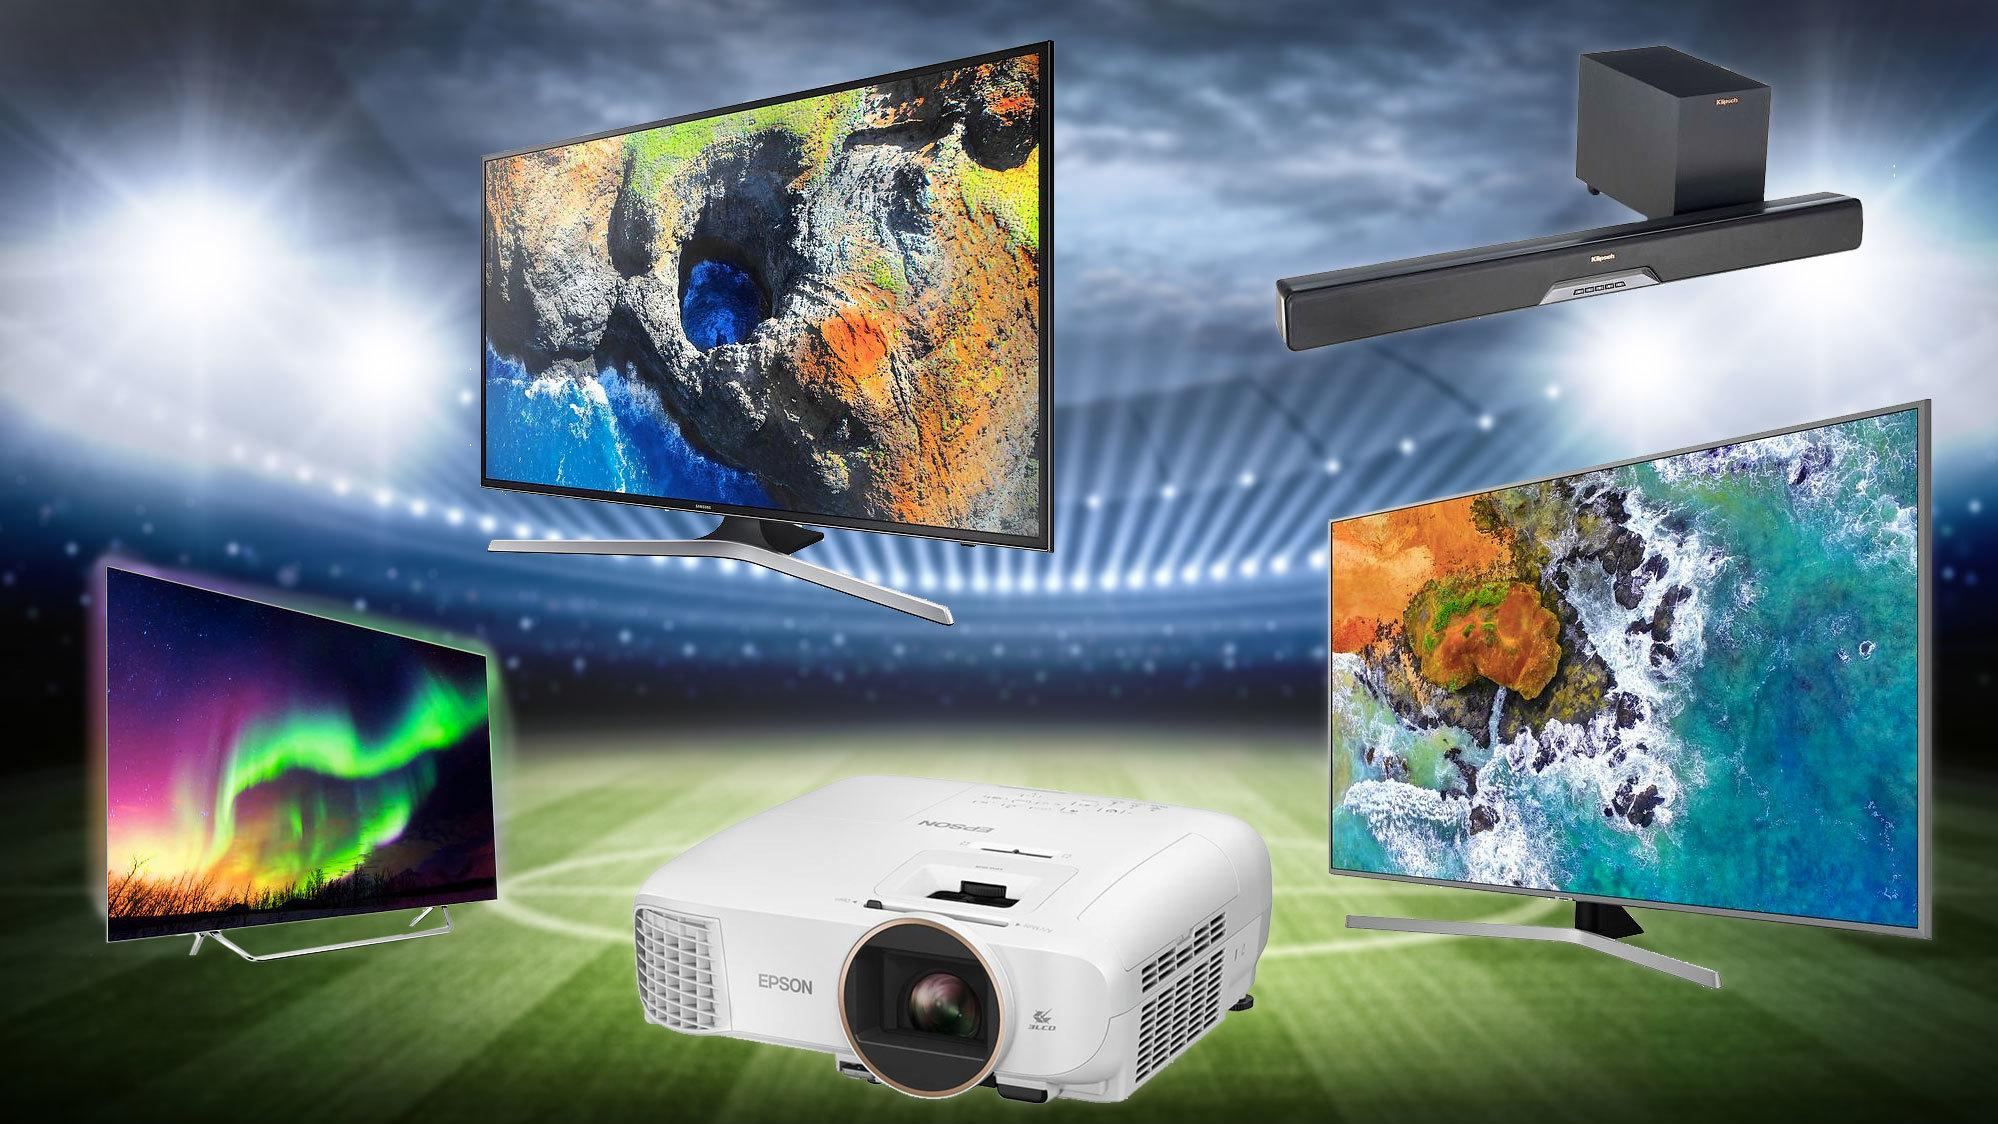 Ny TV, projektor eller lydplanke til VM? Disse er best